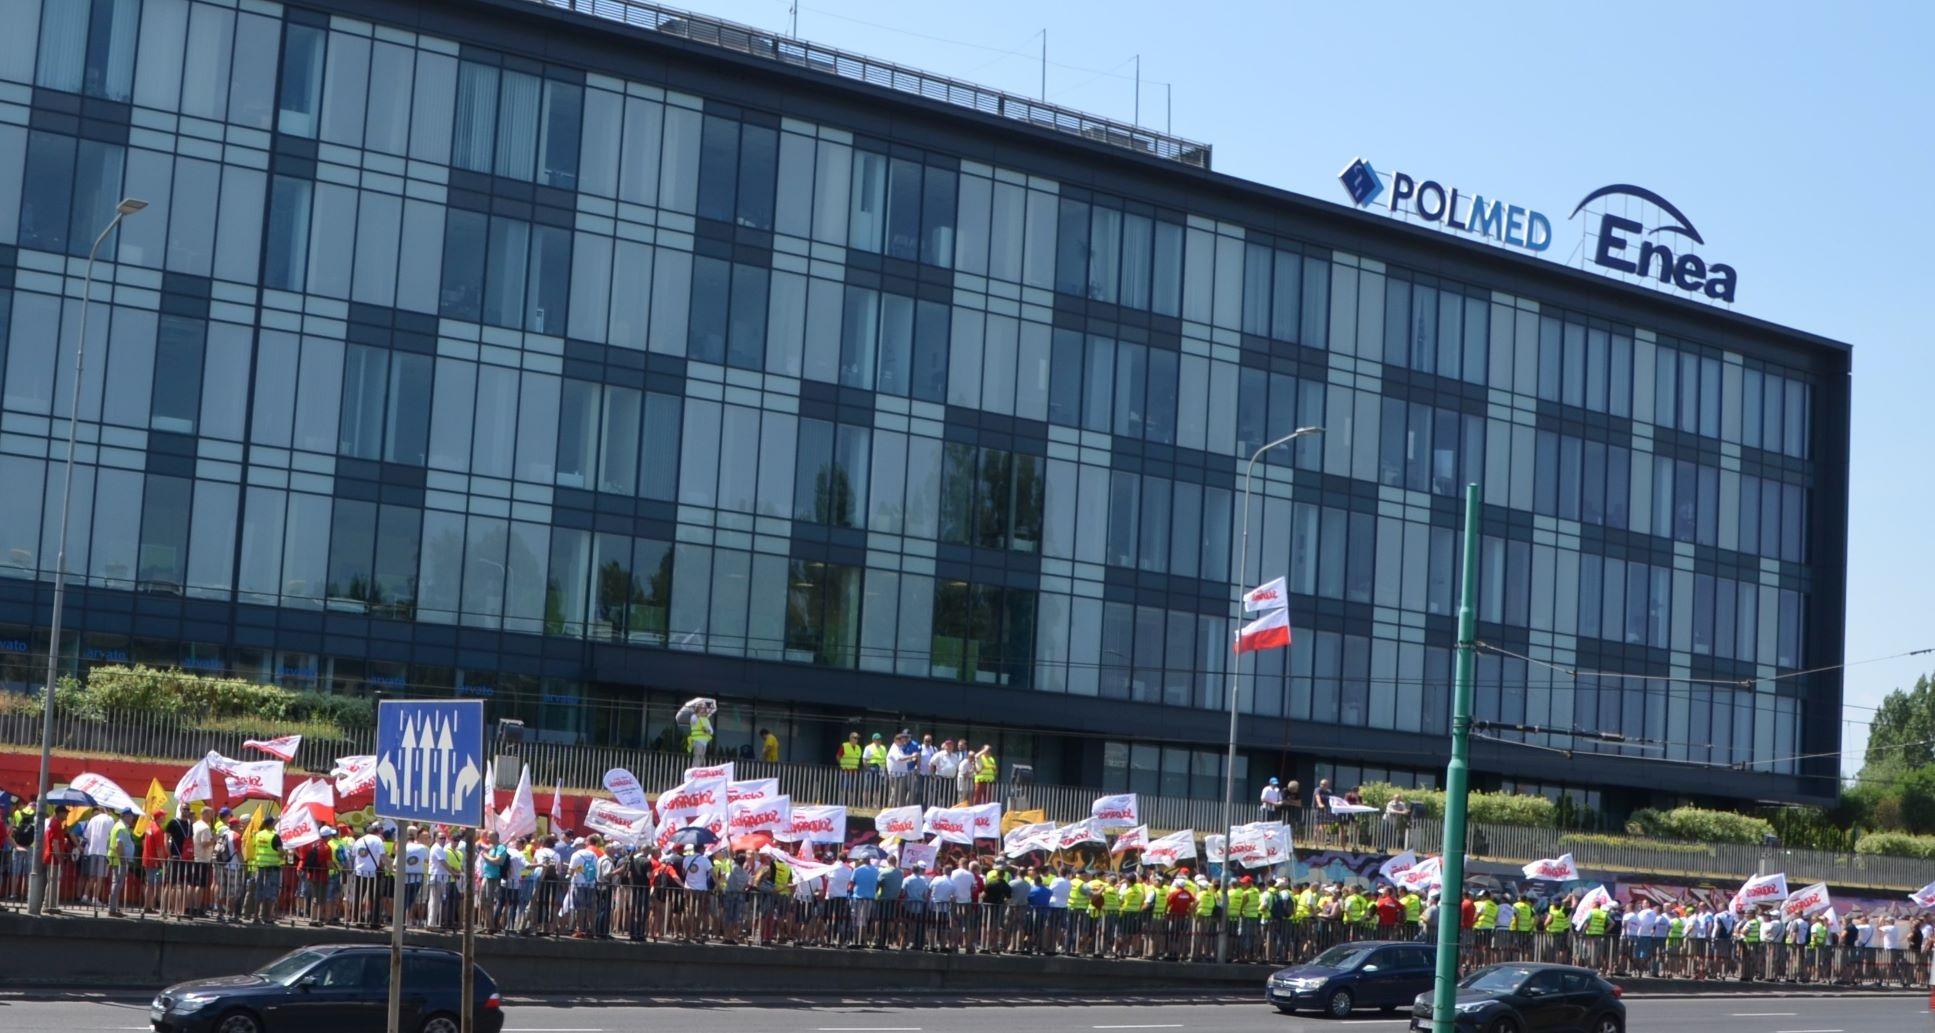 2019.06.26 Manifa Poznań (47)